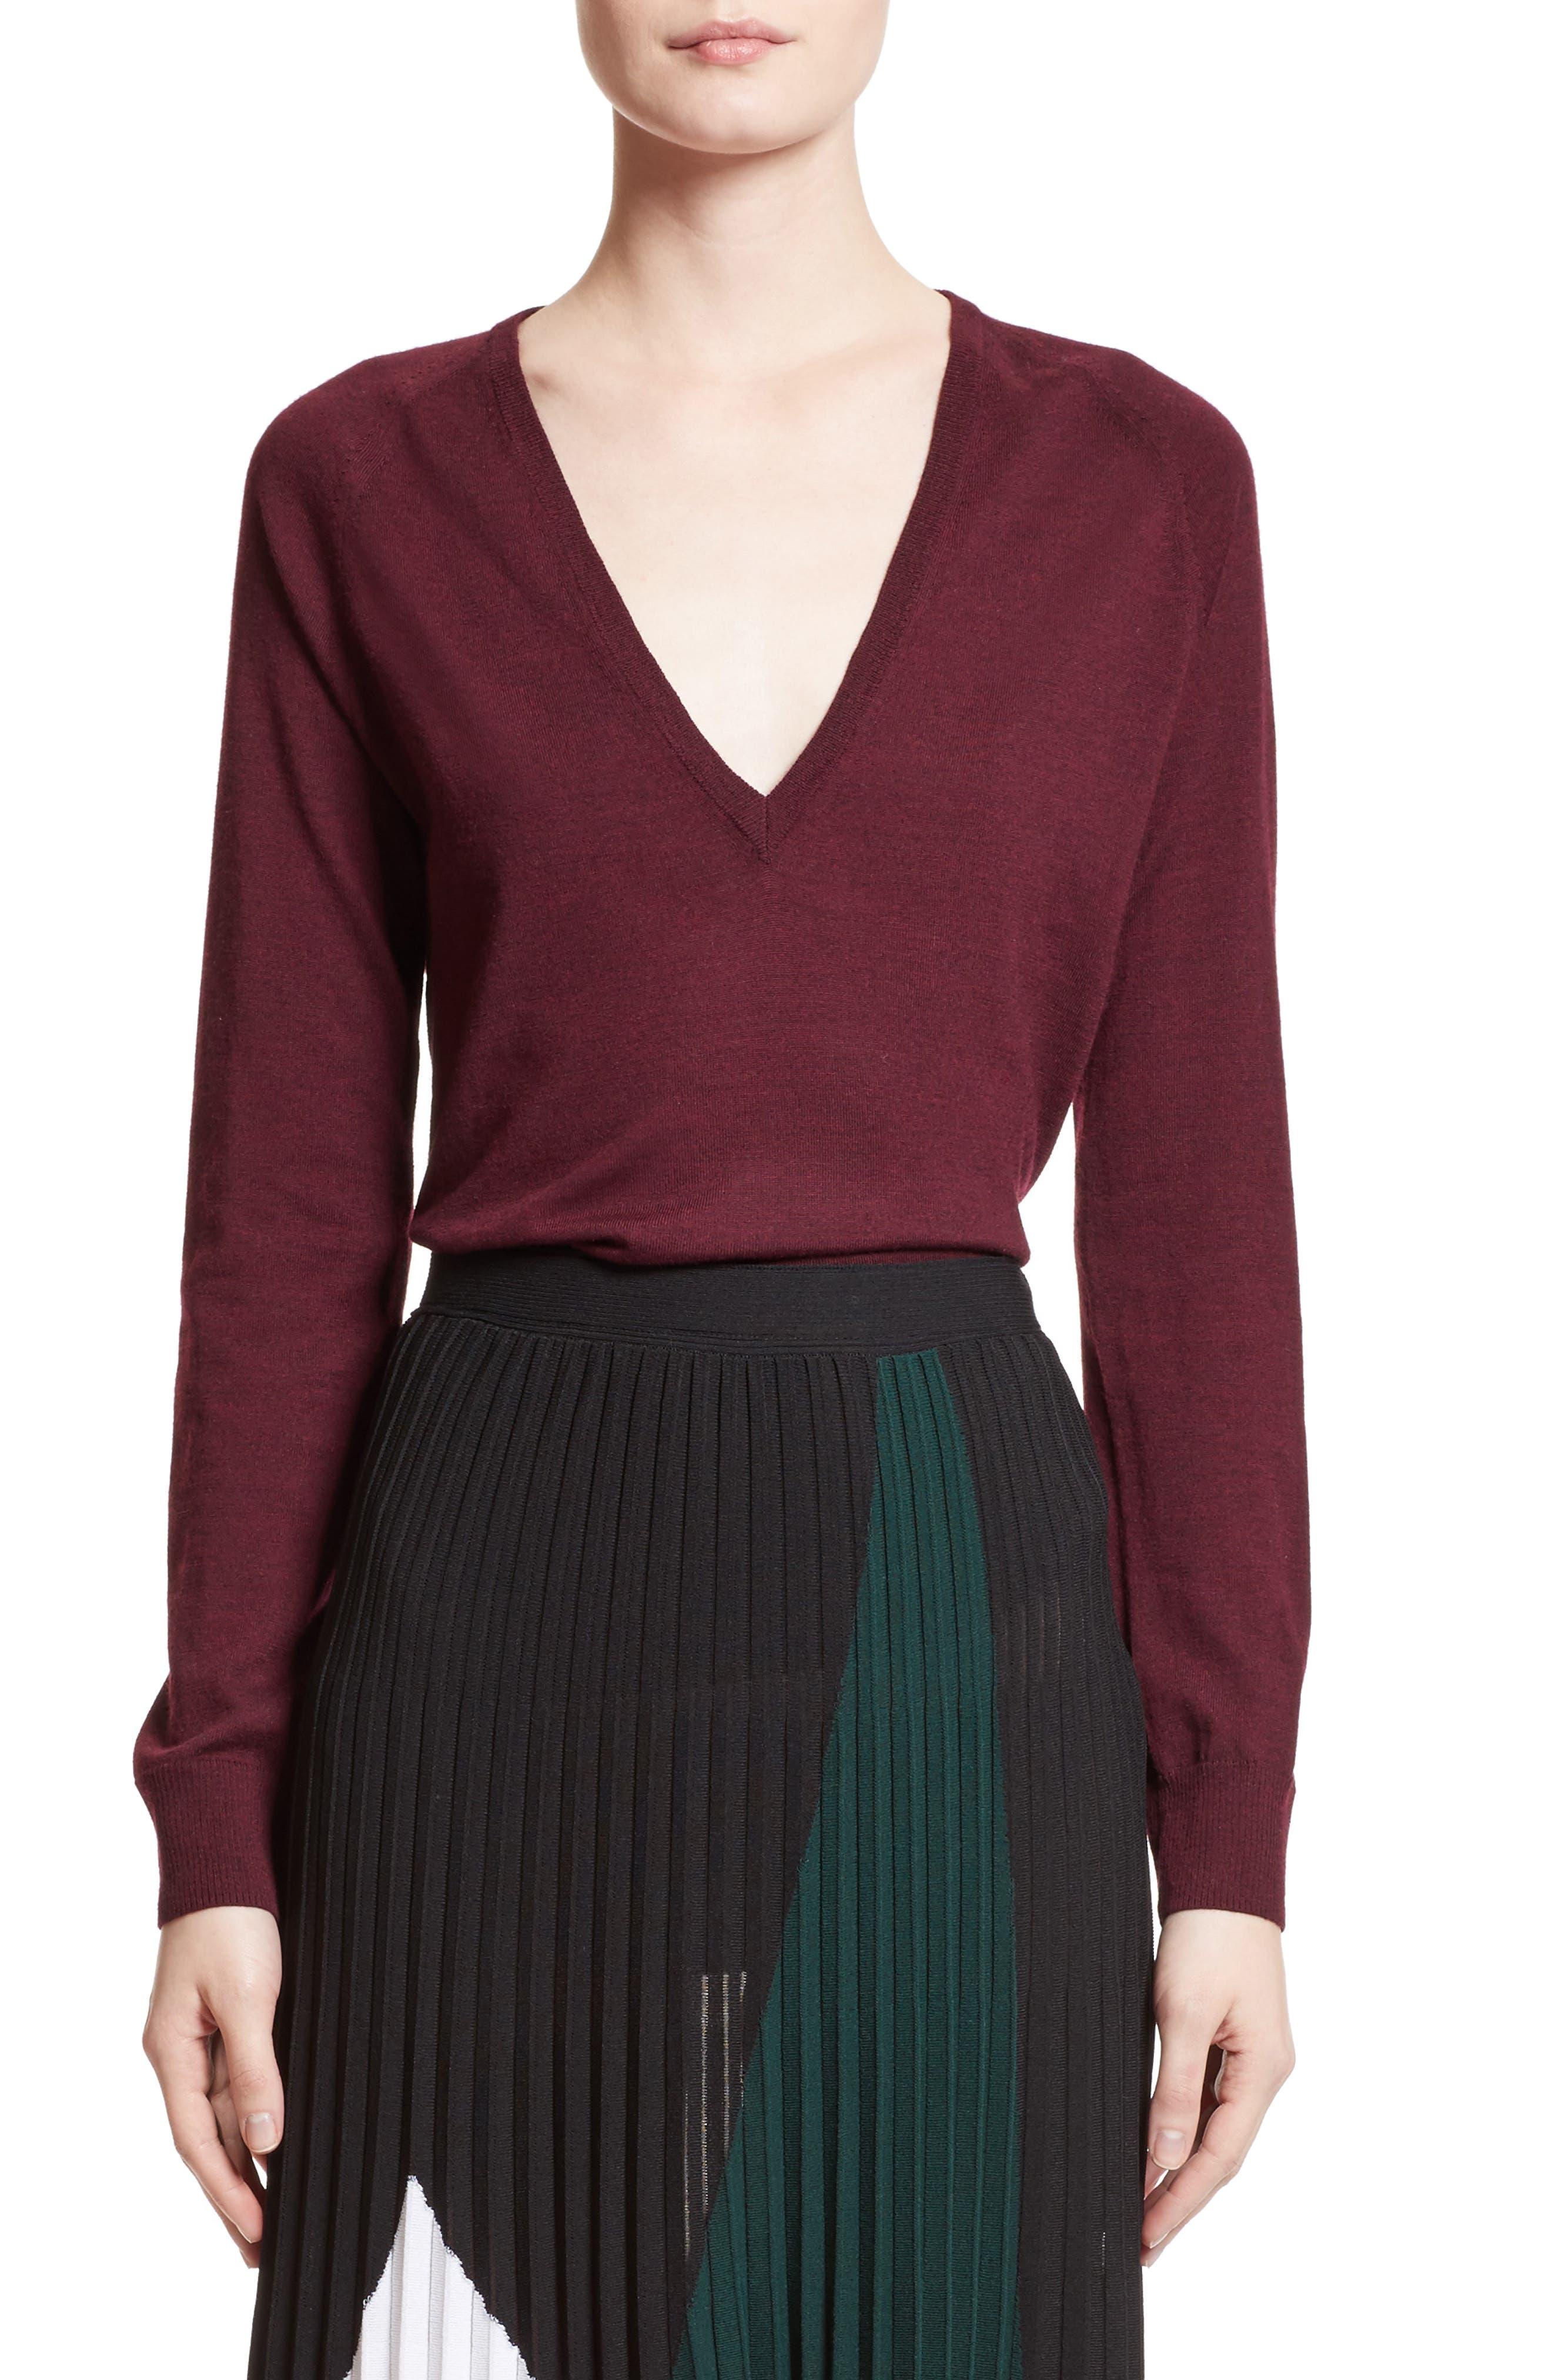 Proenza Schouler Plunging V-Neck Merino Wool Sweater